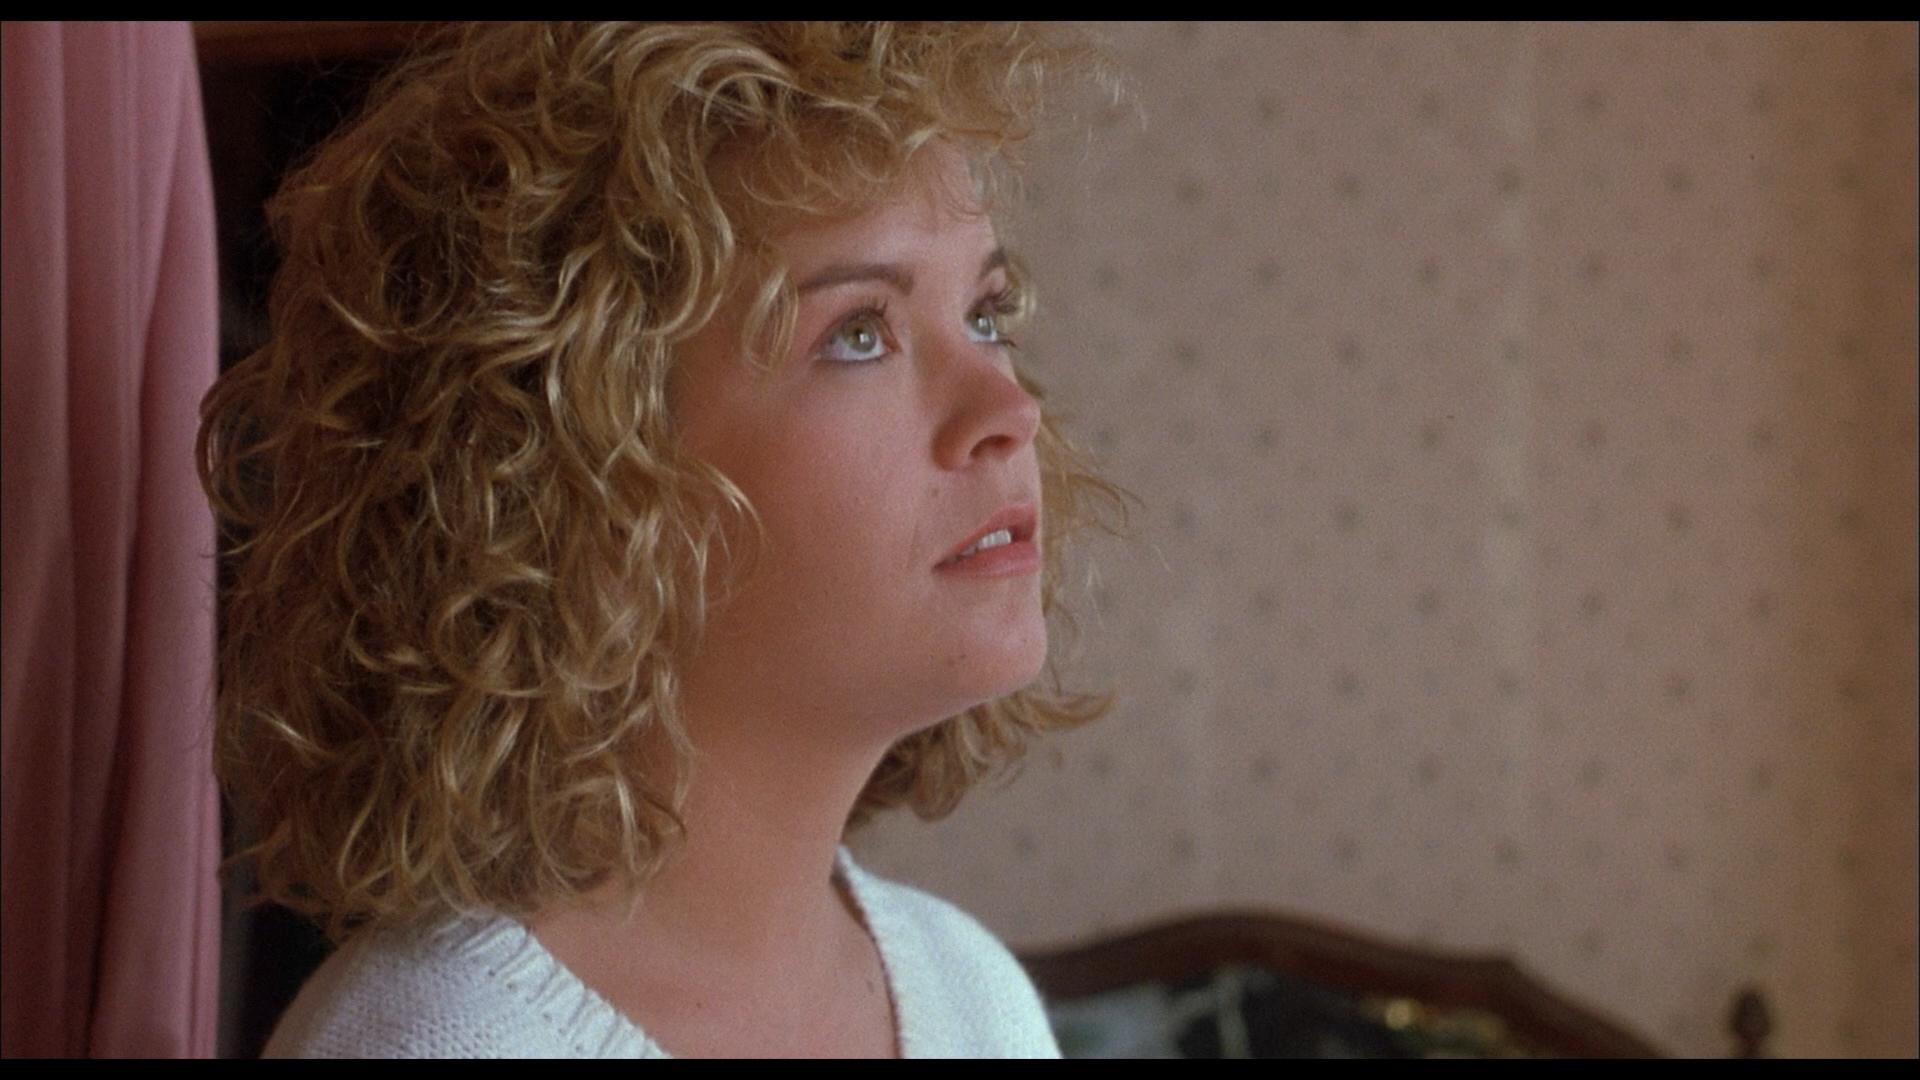 Rachel, la hermana adoptiva de Jamie